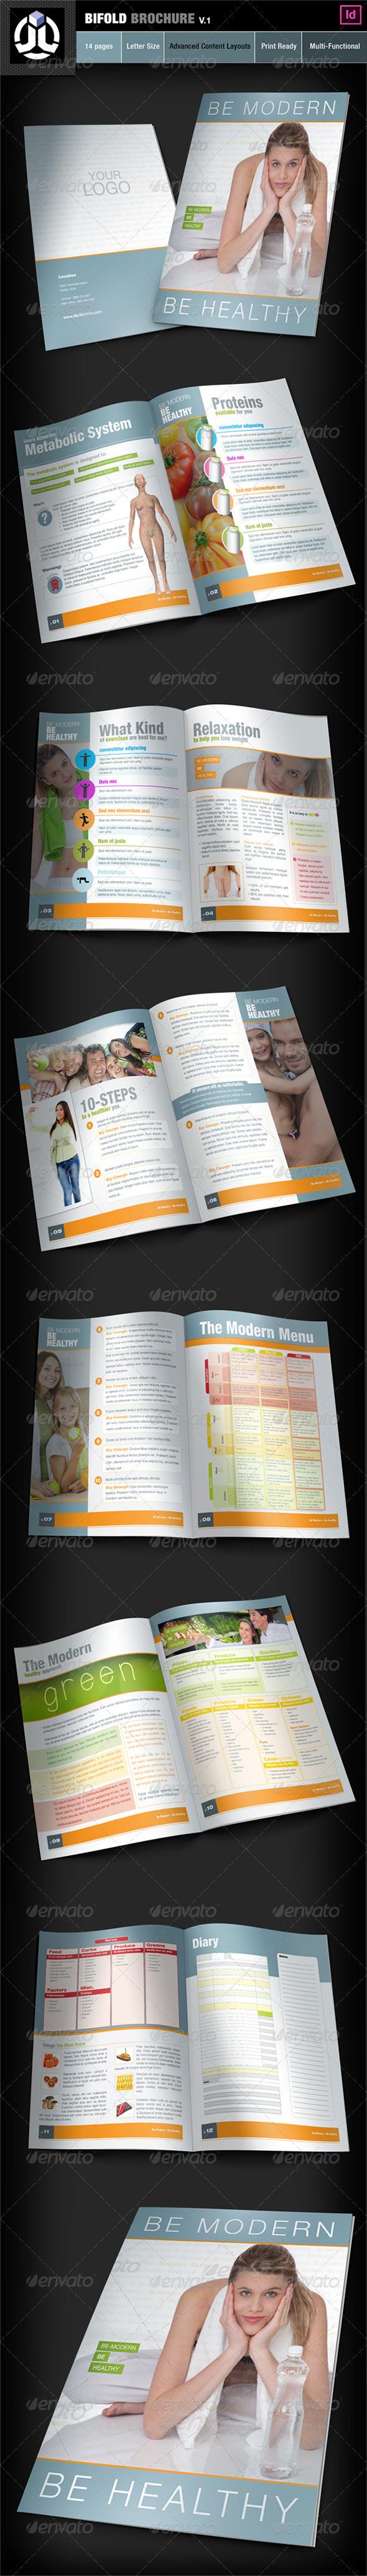 GraphicRiver Bifold Brochure V1 6326792